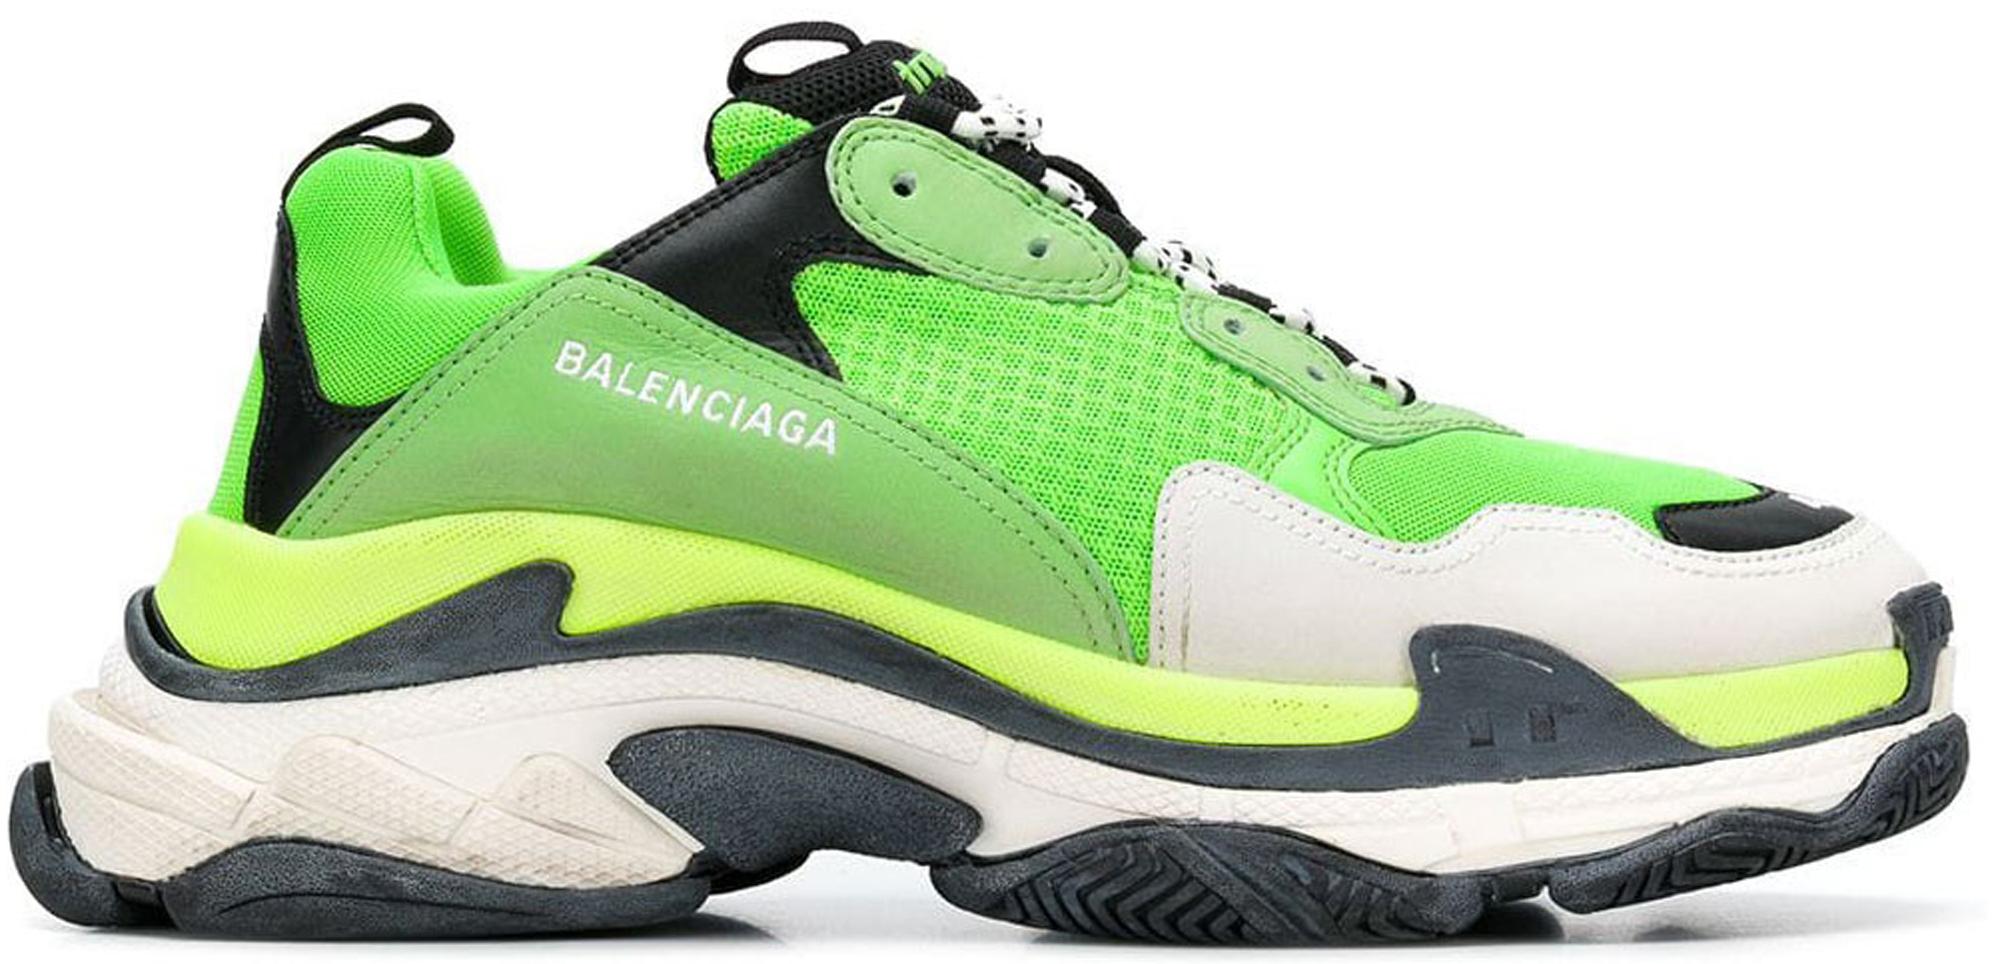 Balenciaga Triple S Lime Green - Sneakers